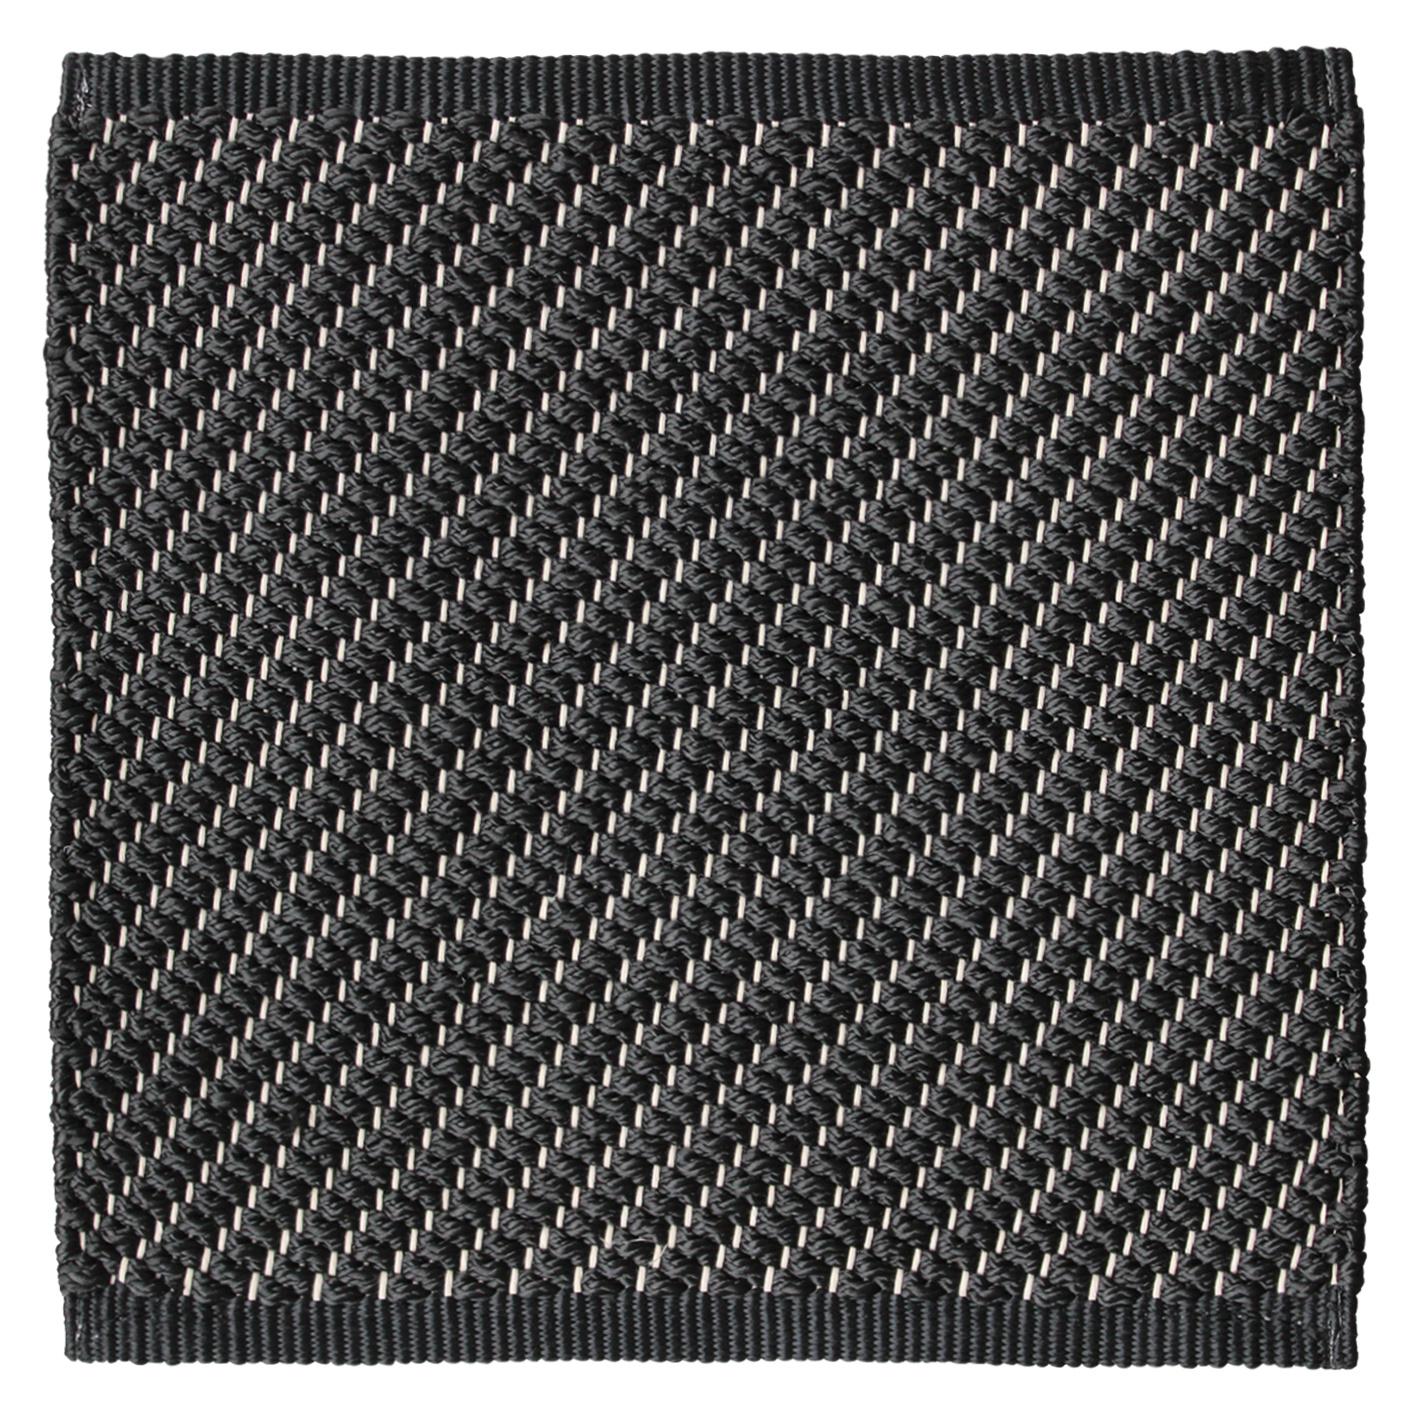 Frankly Amsterdam Coast Line rug